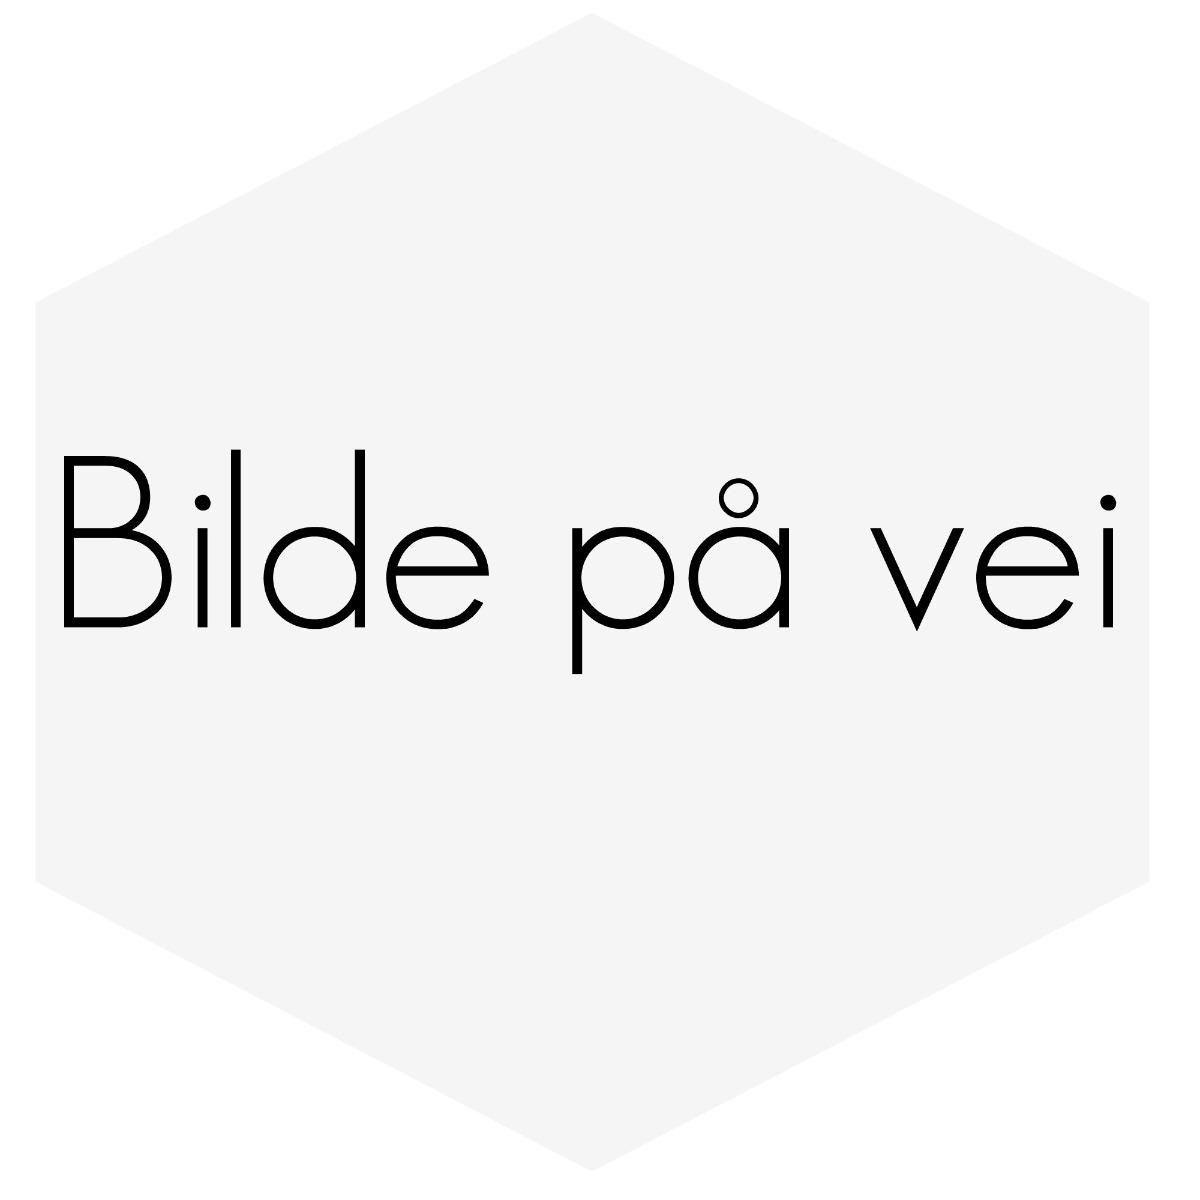 FJÆR BAK V40 STD. 96-9mnd.1999  ikke T4  pris pr.stk